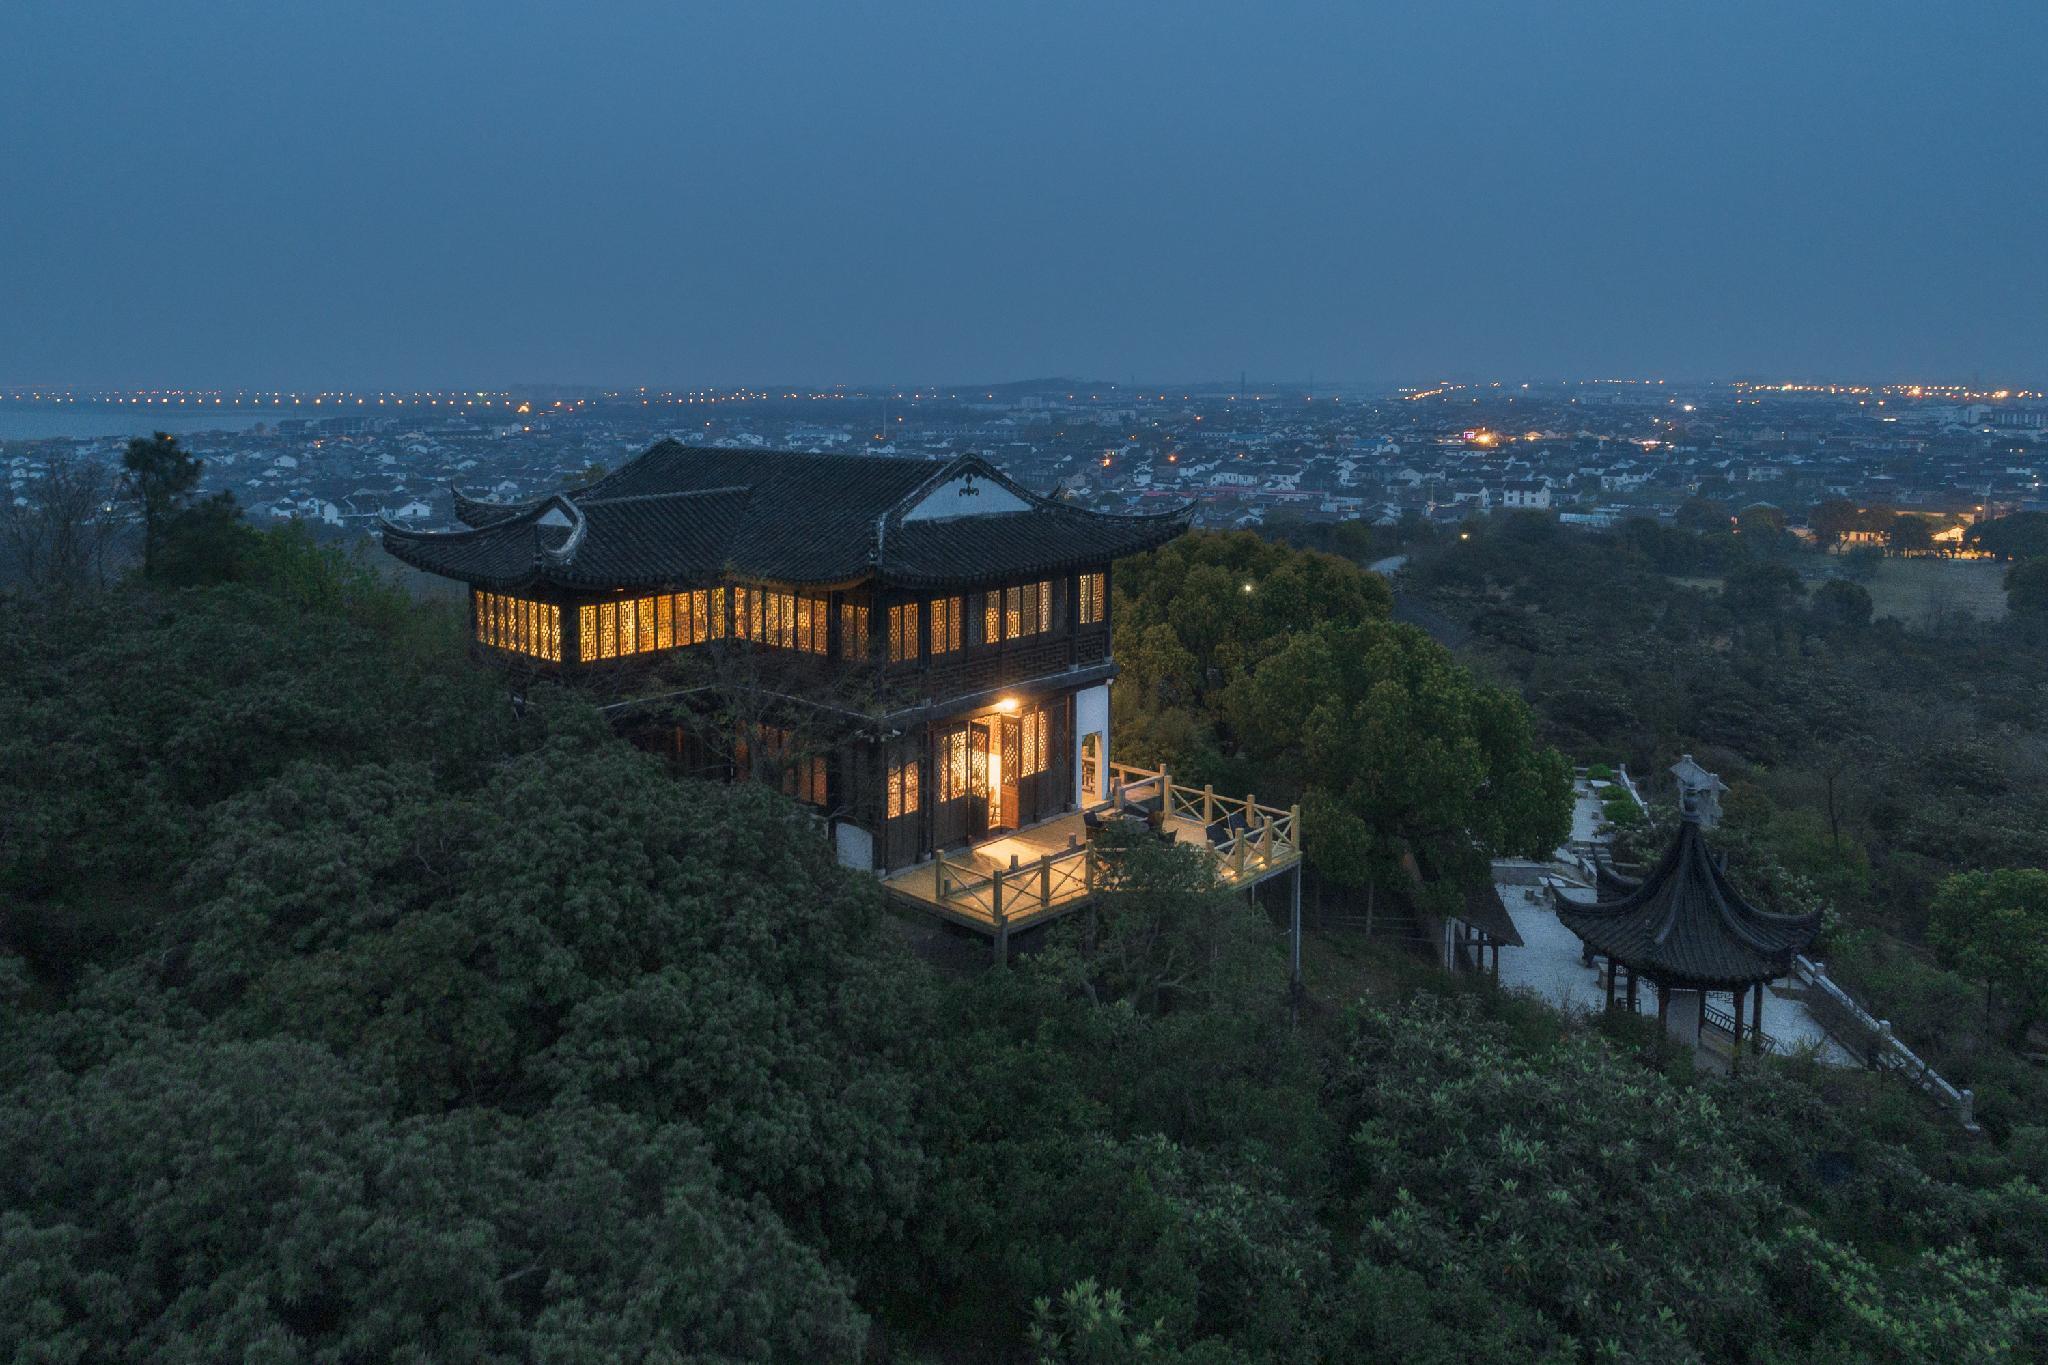 Yuhua House